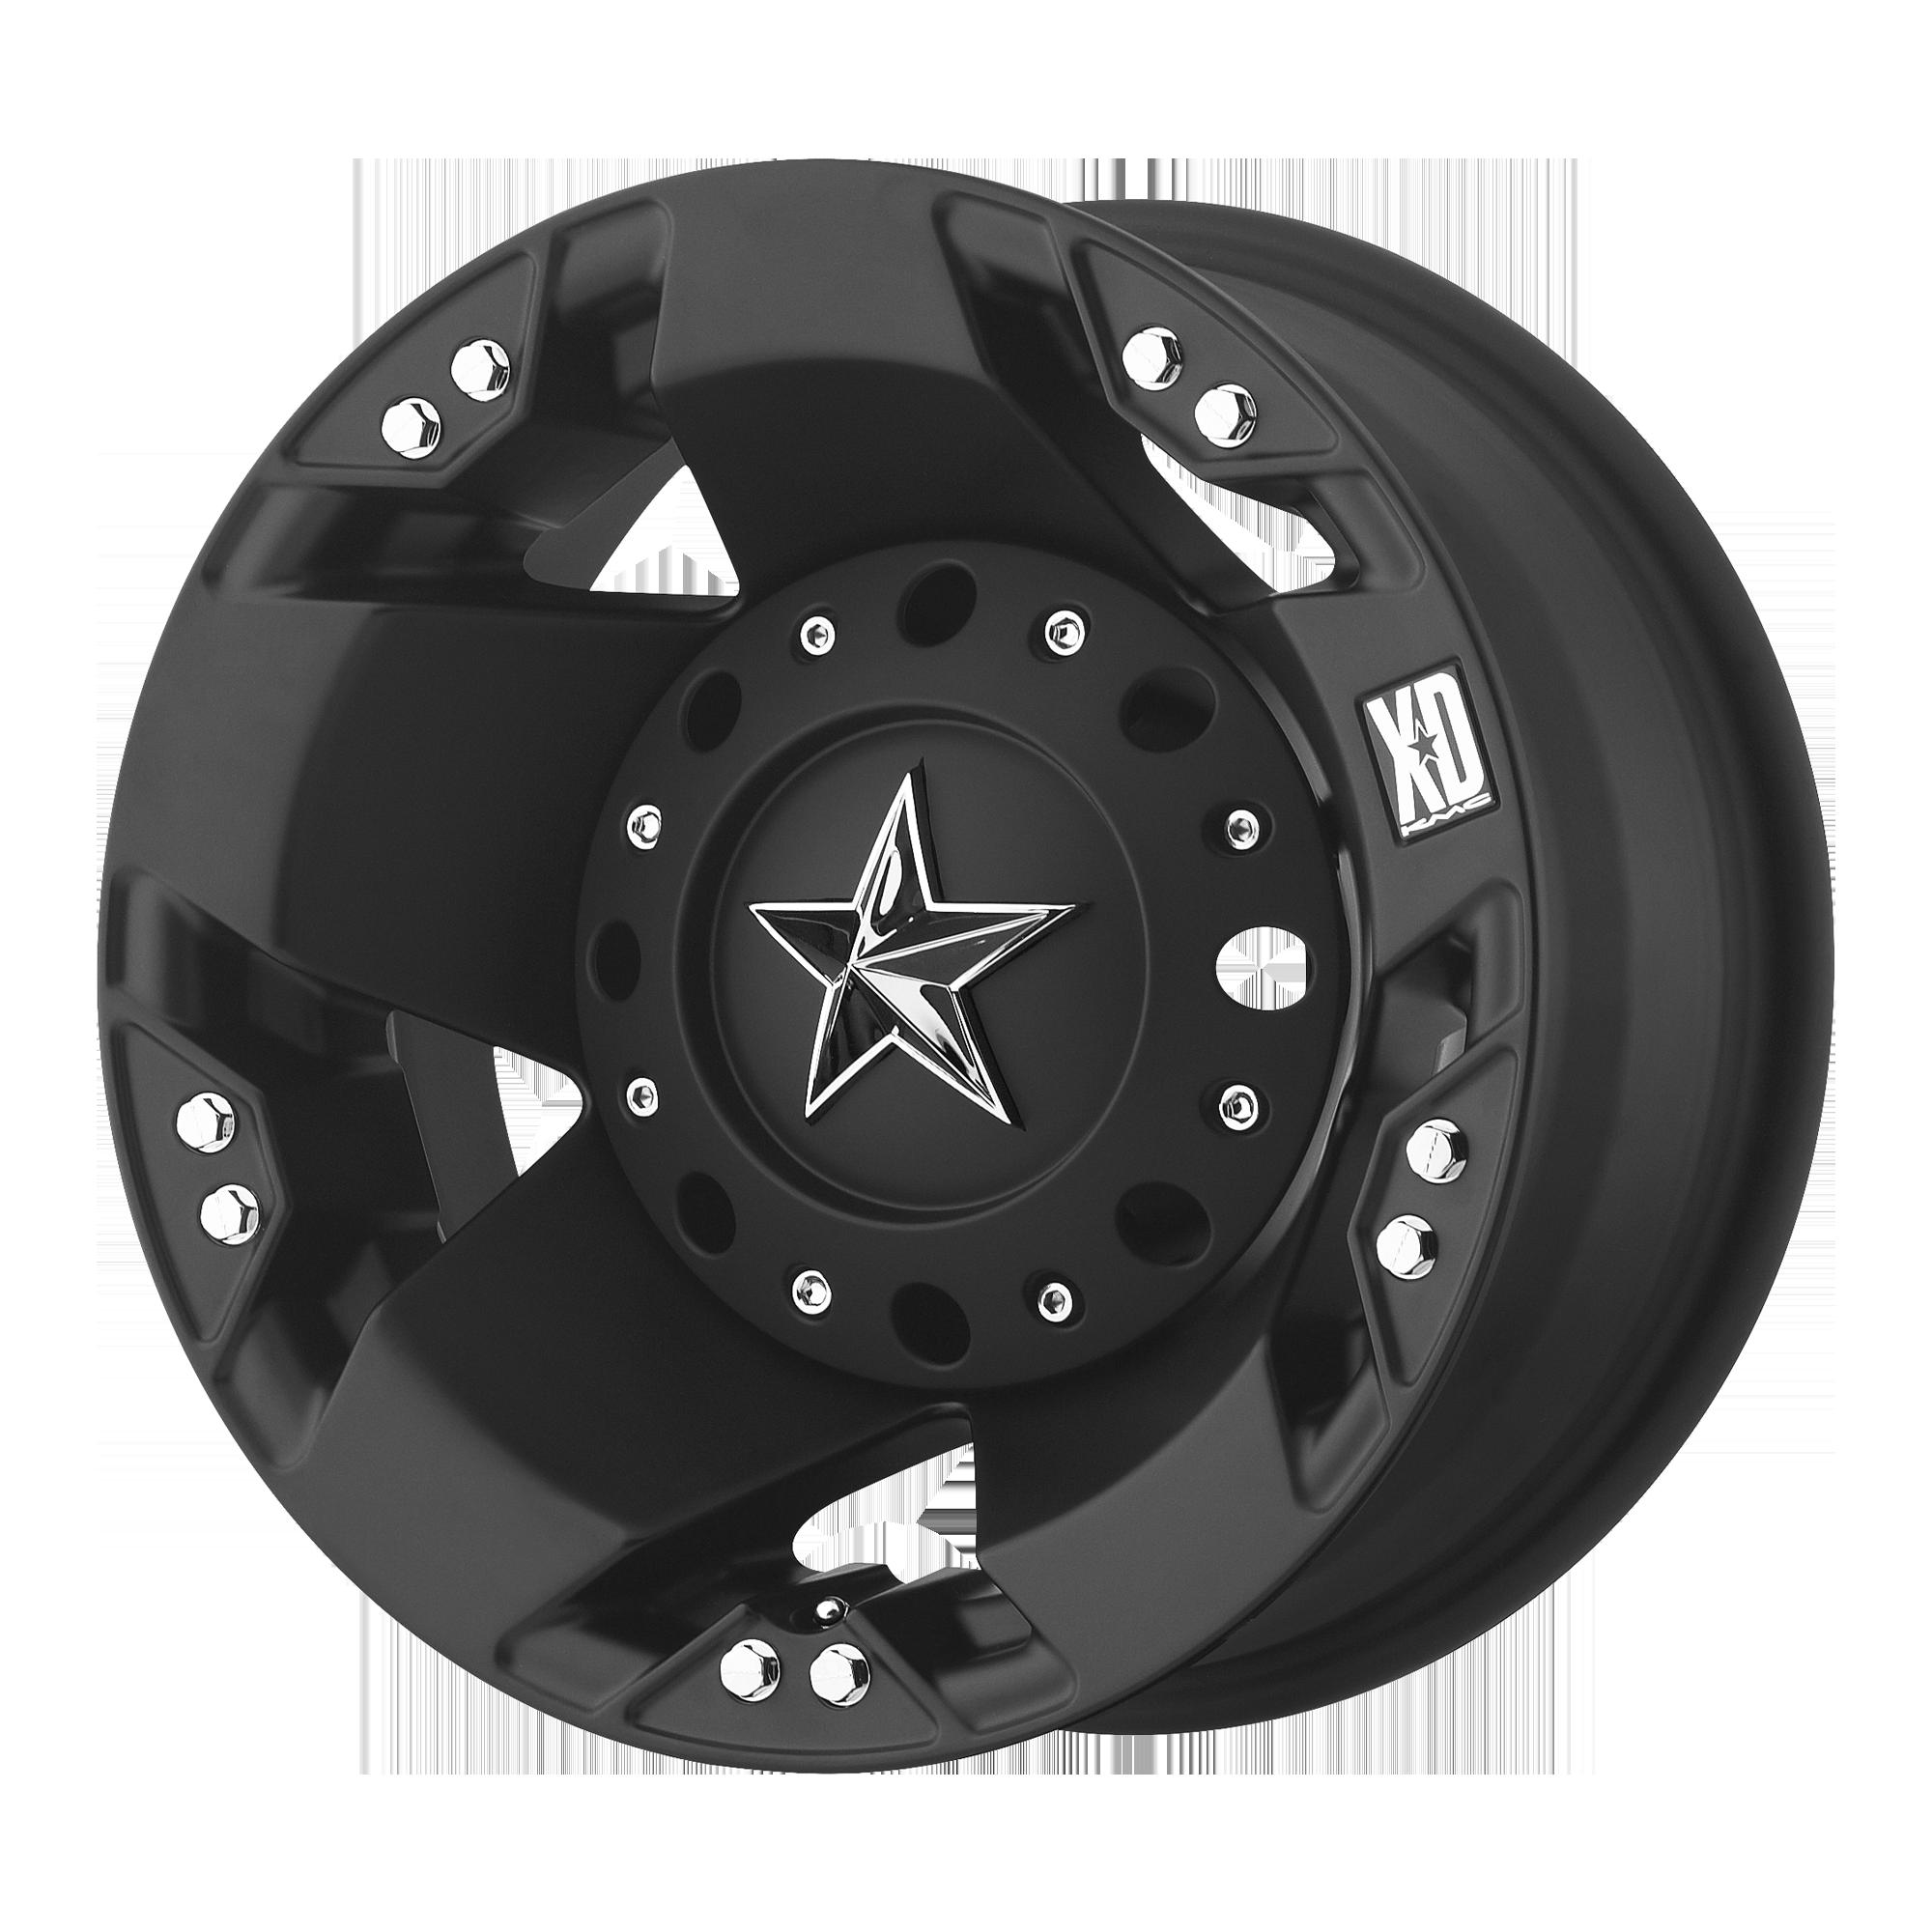 XD SERIES XD775 ROCKSTAR hliníkové disky 6x17 8x165,1 ET-134 Matte Black - Rear